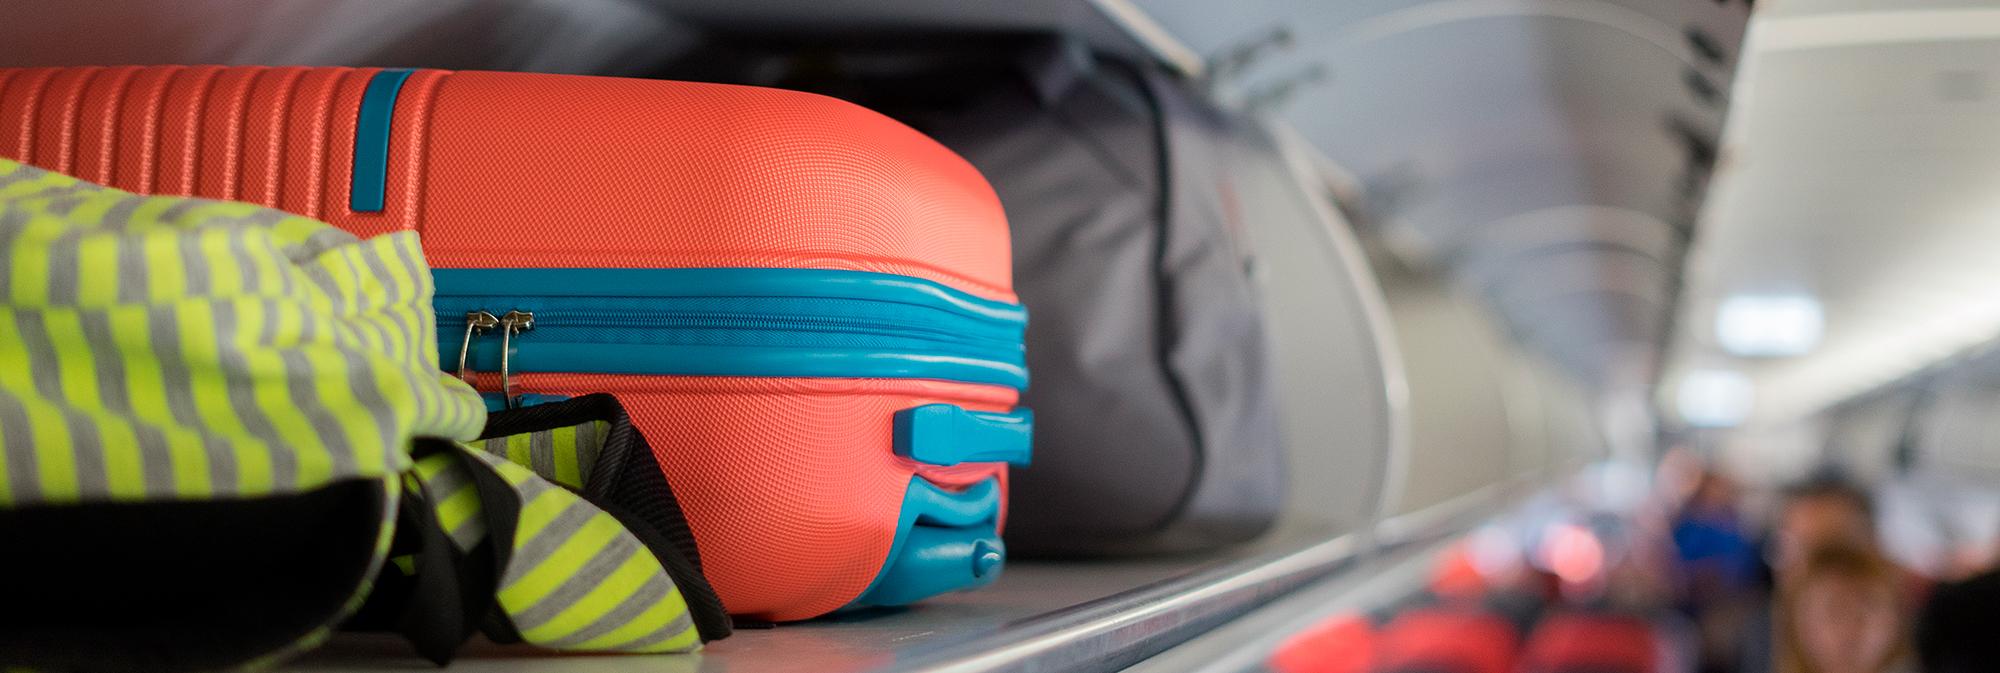 Провоз багажа в авиакомпании победа